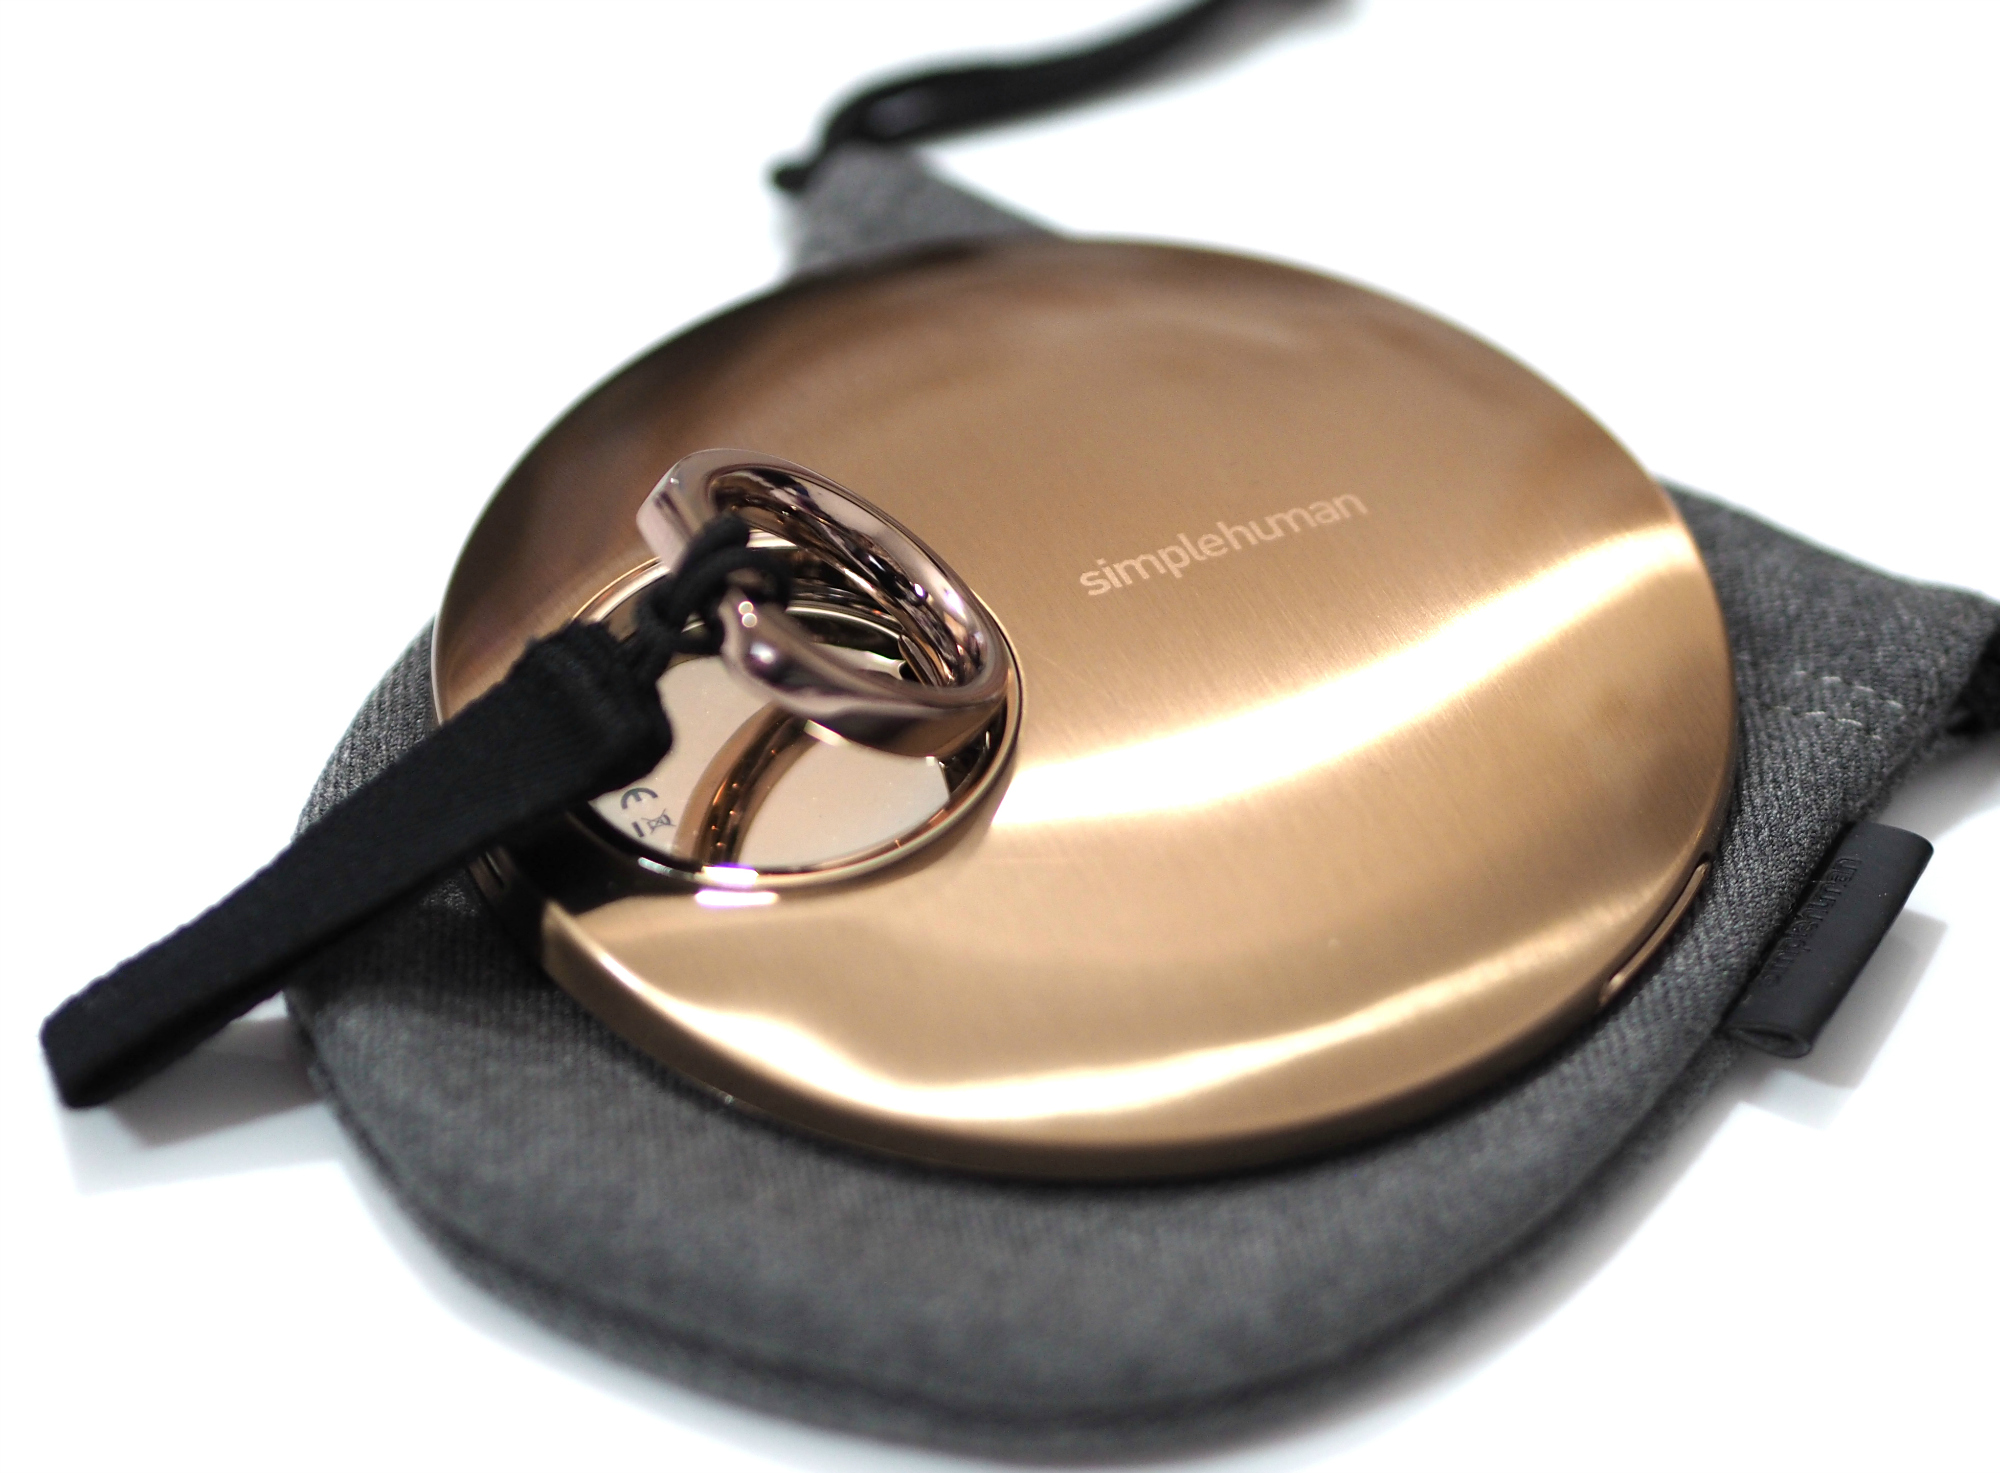 Simplehuman Sensor Mirror Compact Review